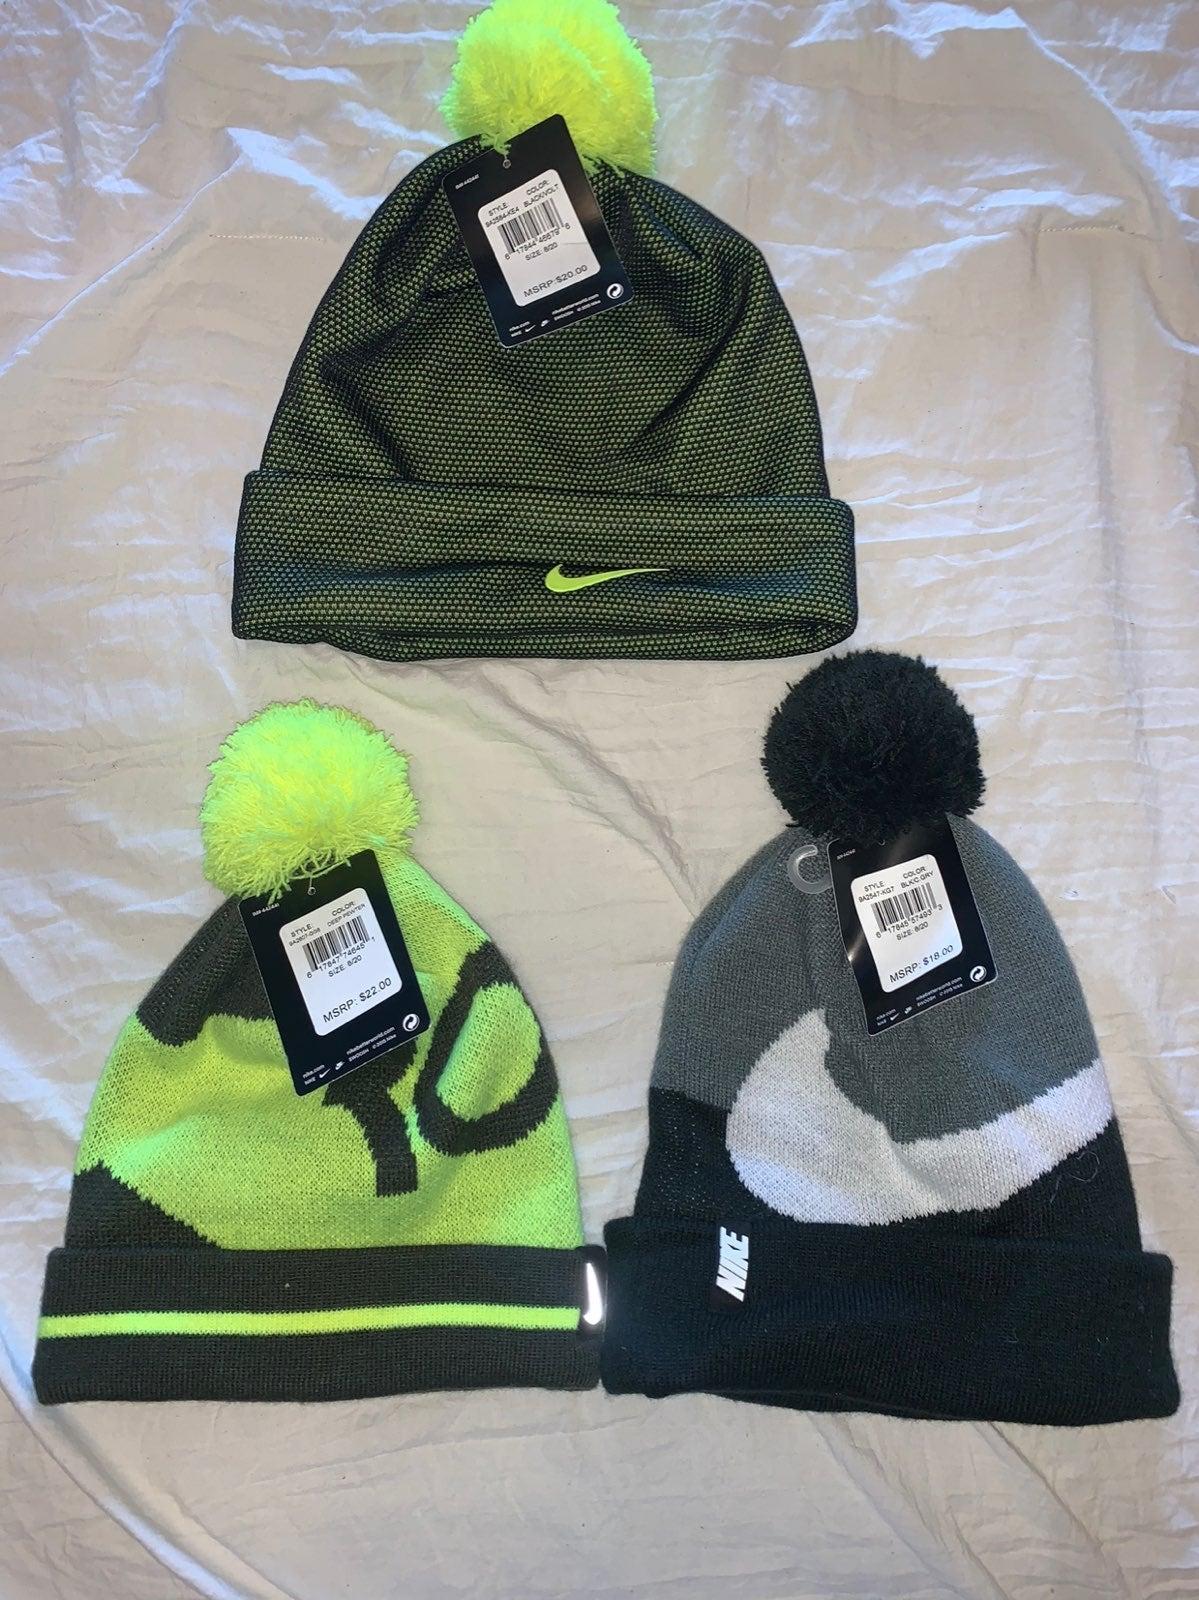 NWT Lot Of 3 Boys Nike Beanie Hats